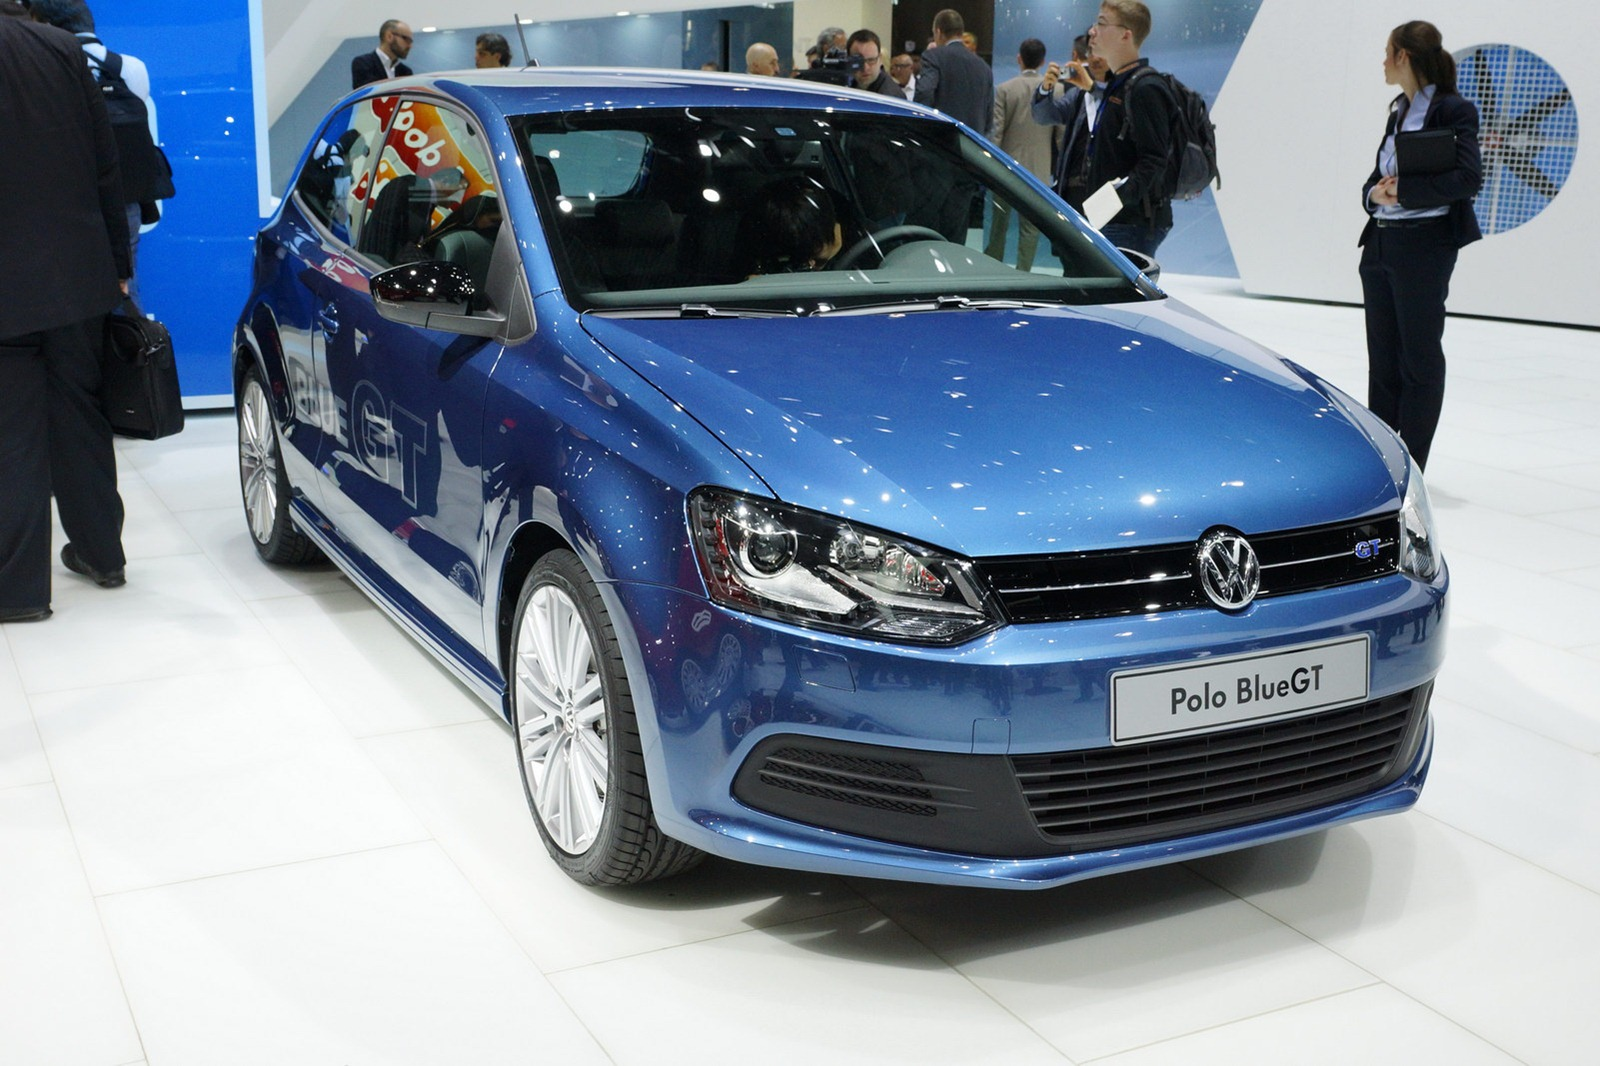 vw new car releaseNew Volkswagen Polo BlueGT released  Nordschleife Autoblahg